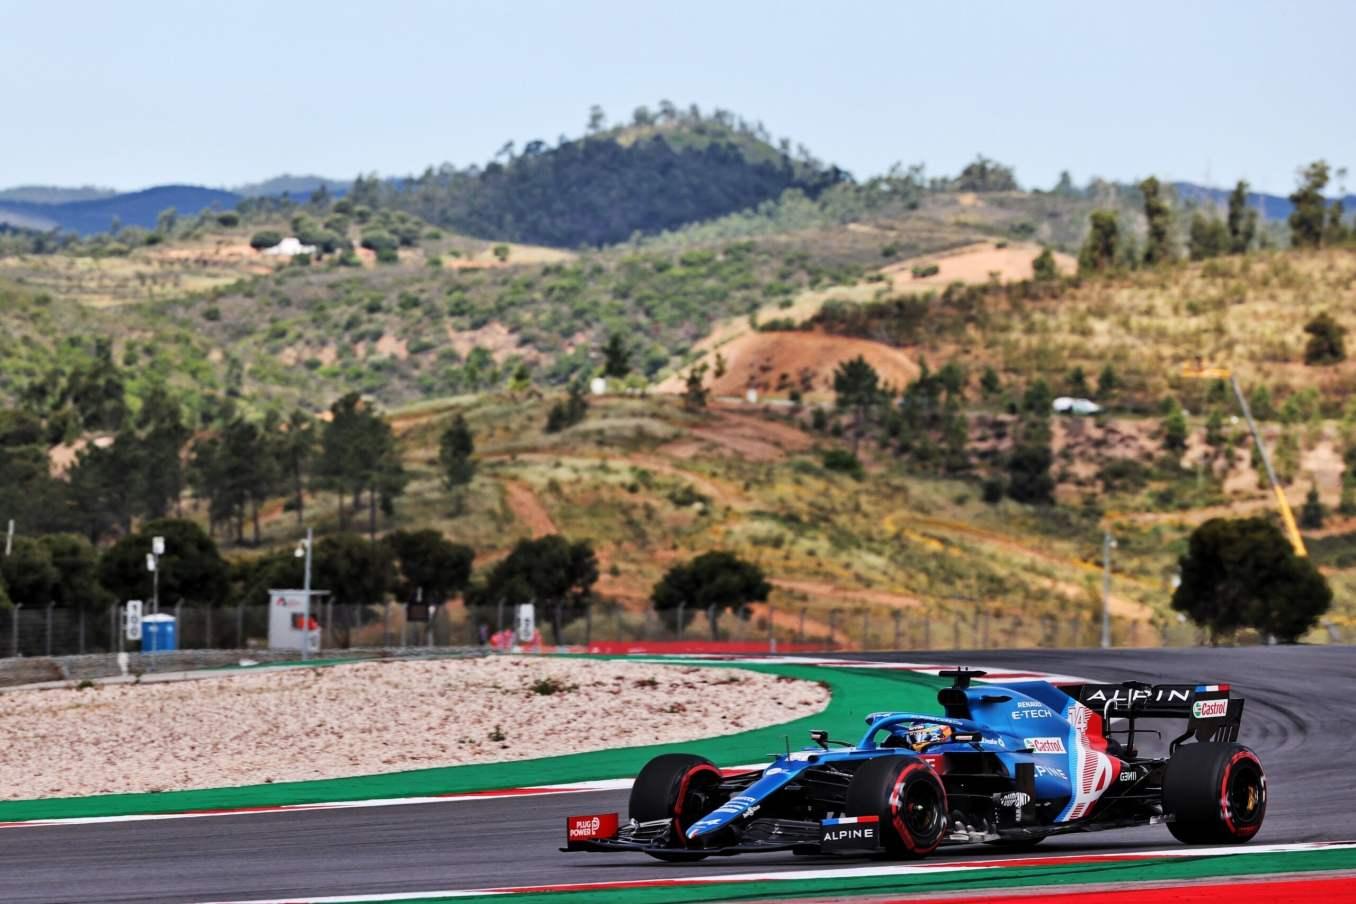 Alpine F1 Team GRAND PRIX HEINEKEN DU PORTUGAL Alonso Ocon 2021 A521 27 scaled   Alpine F1 Team proche du Top 5 aux qualifications du GP du Portugal !